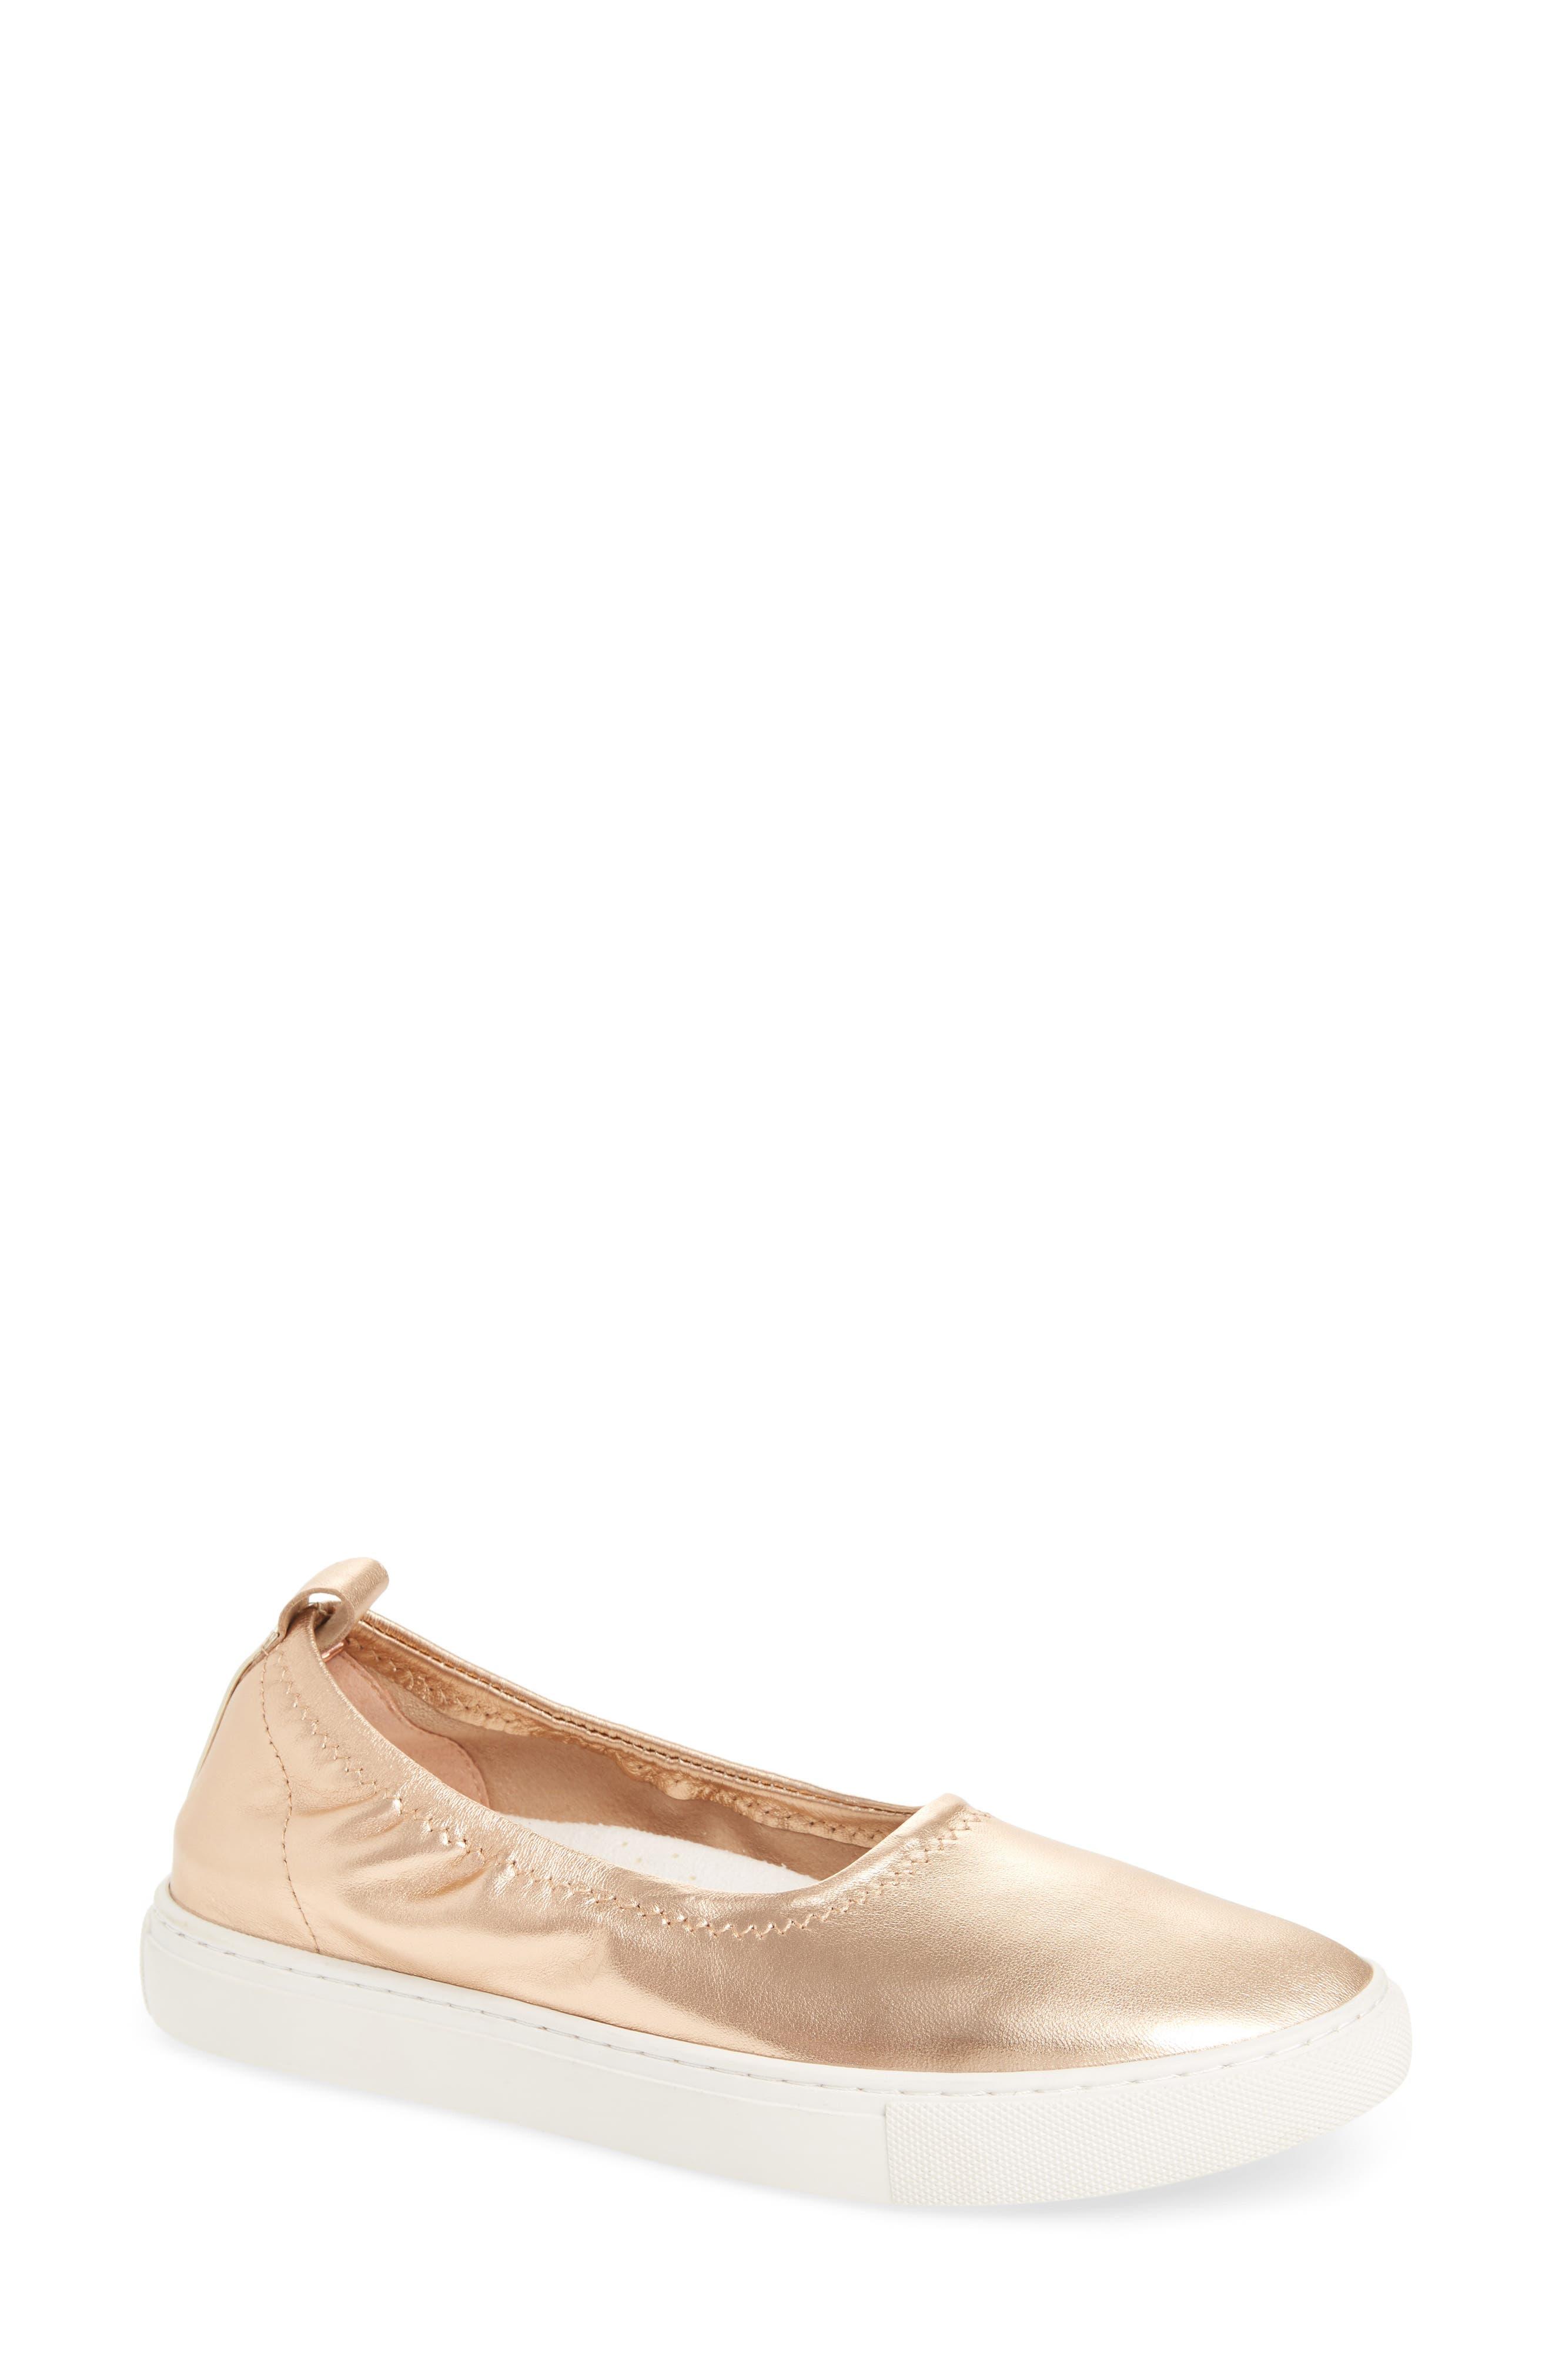 Kam Techni-Cole Ballet Flat,                             Main thumbnail 1, color,                             Rose Gold Leather